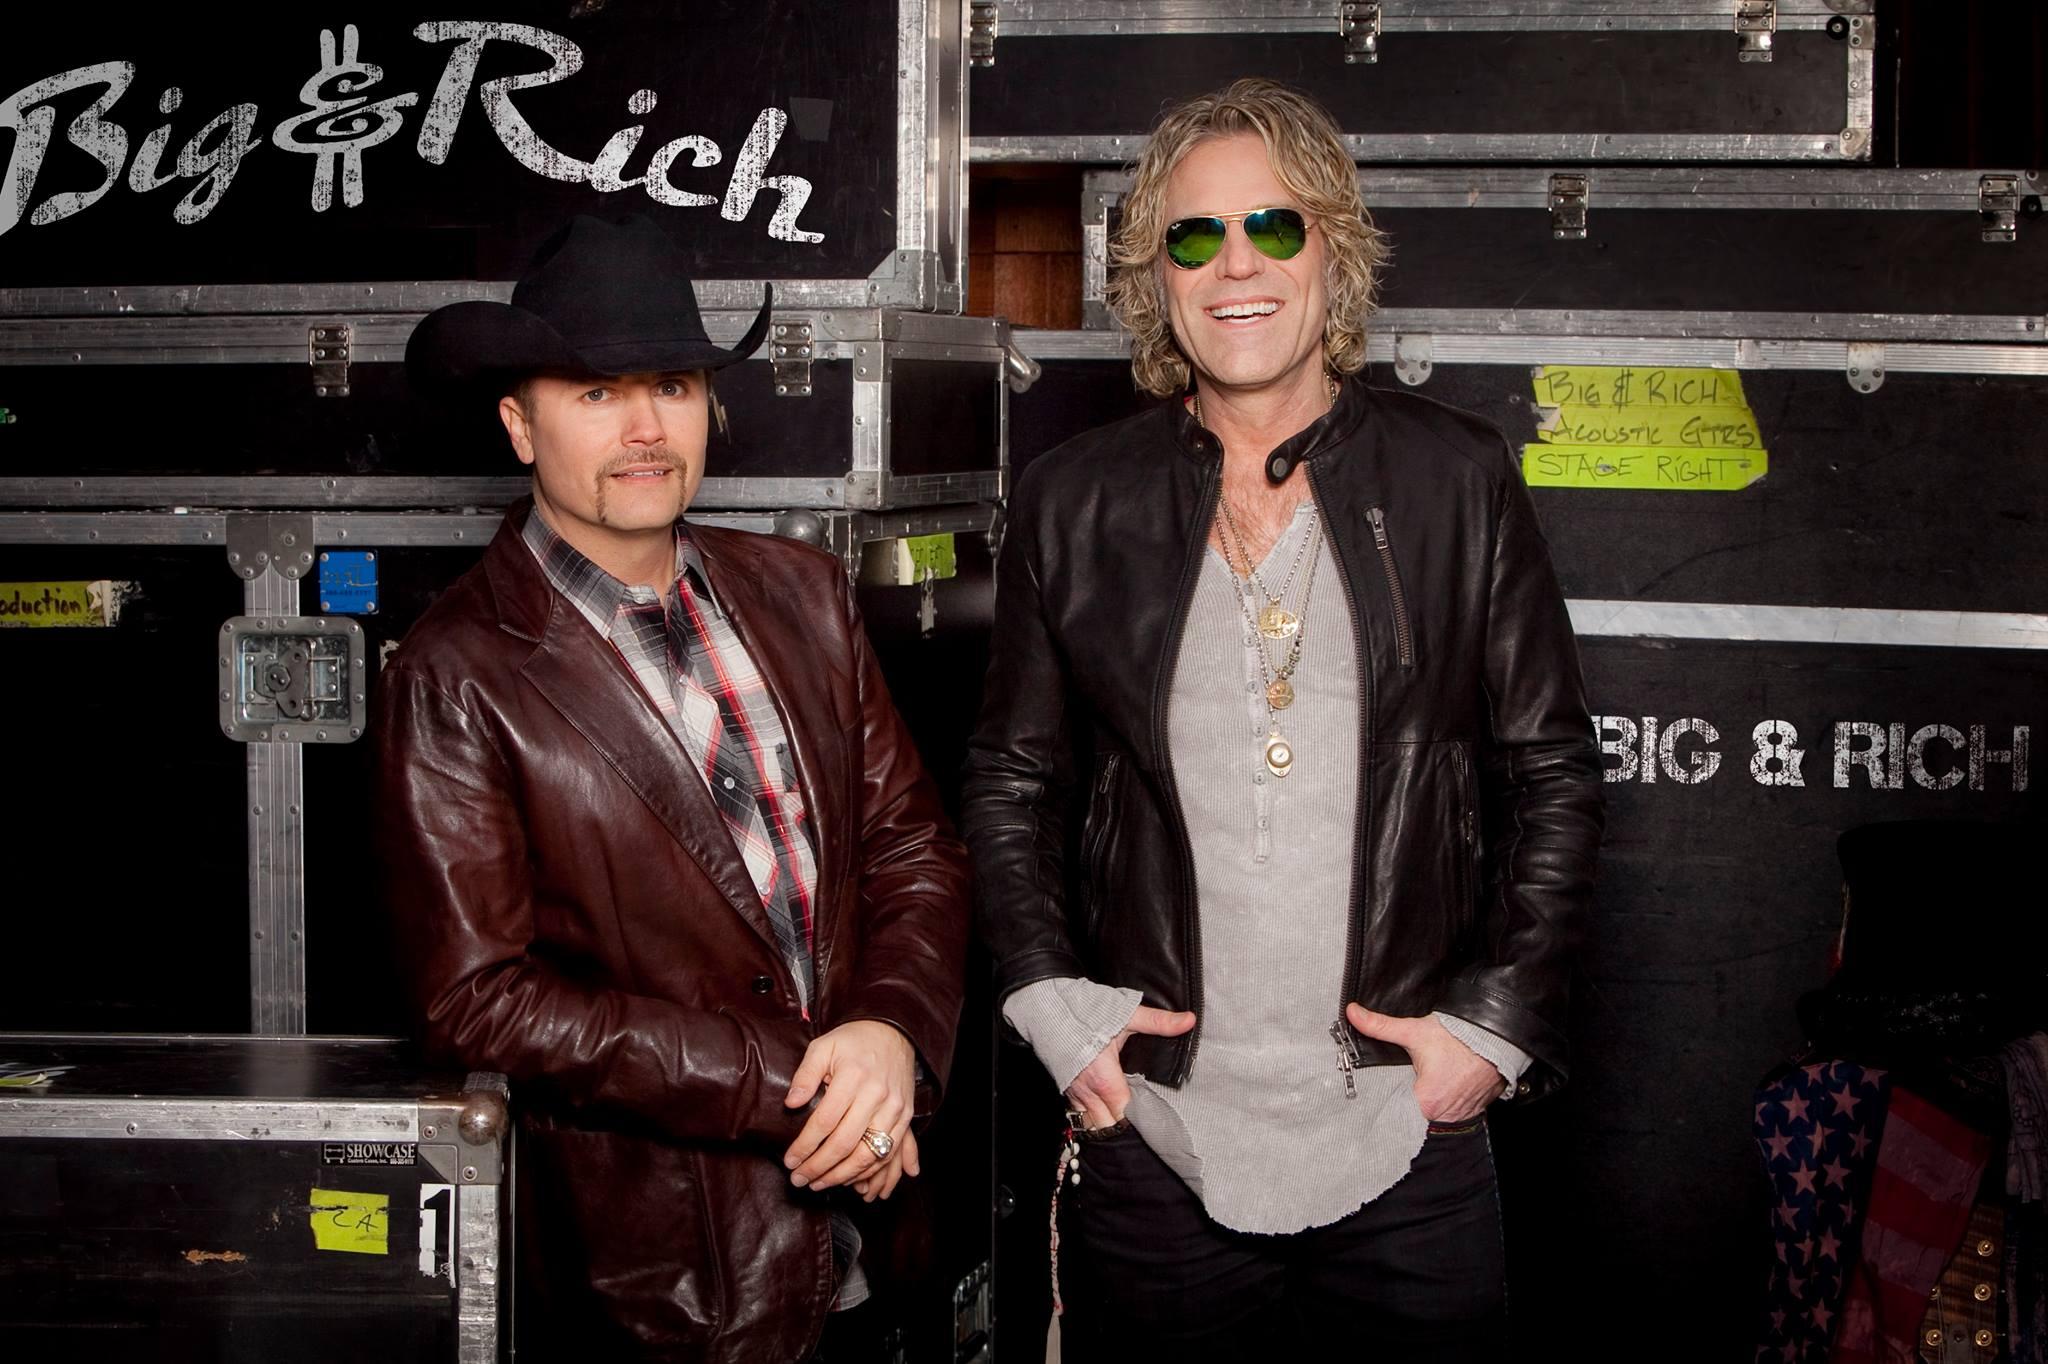 big & rich album